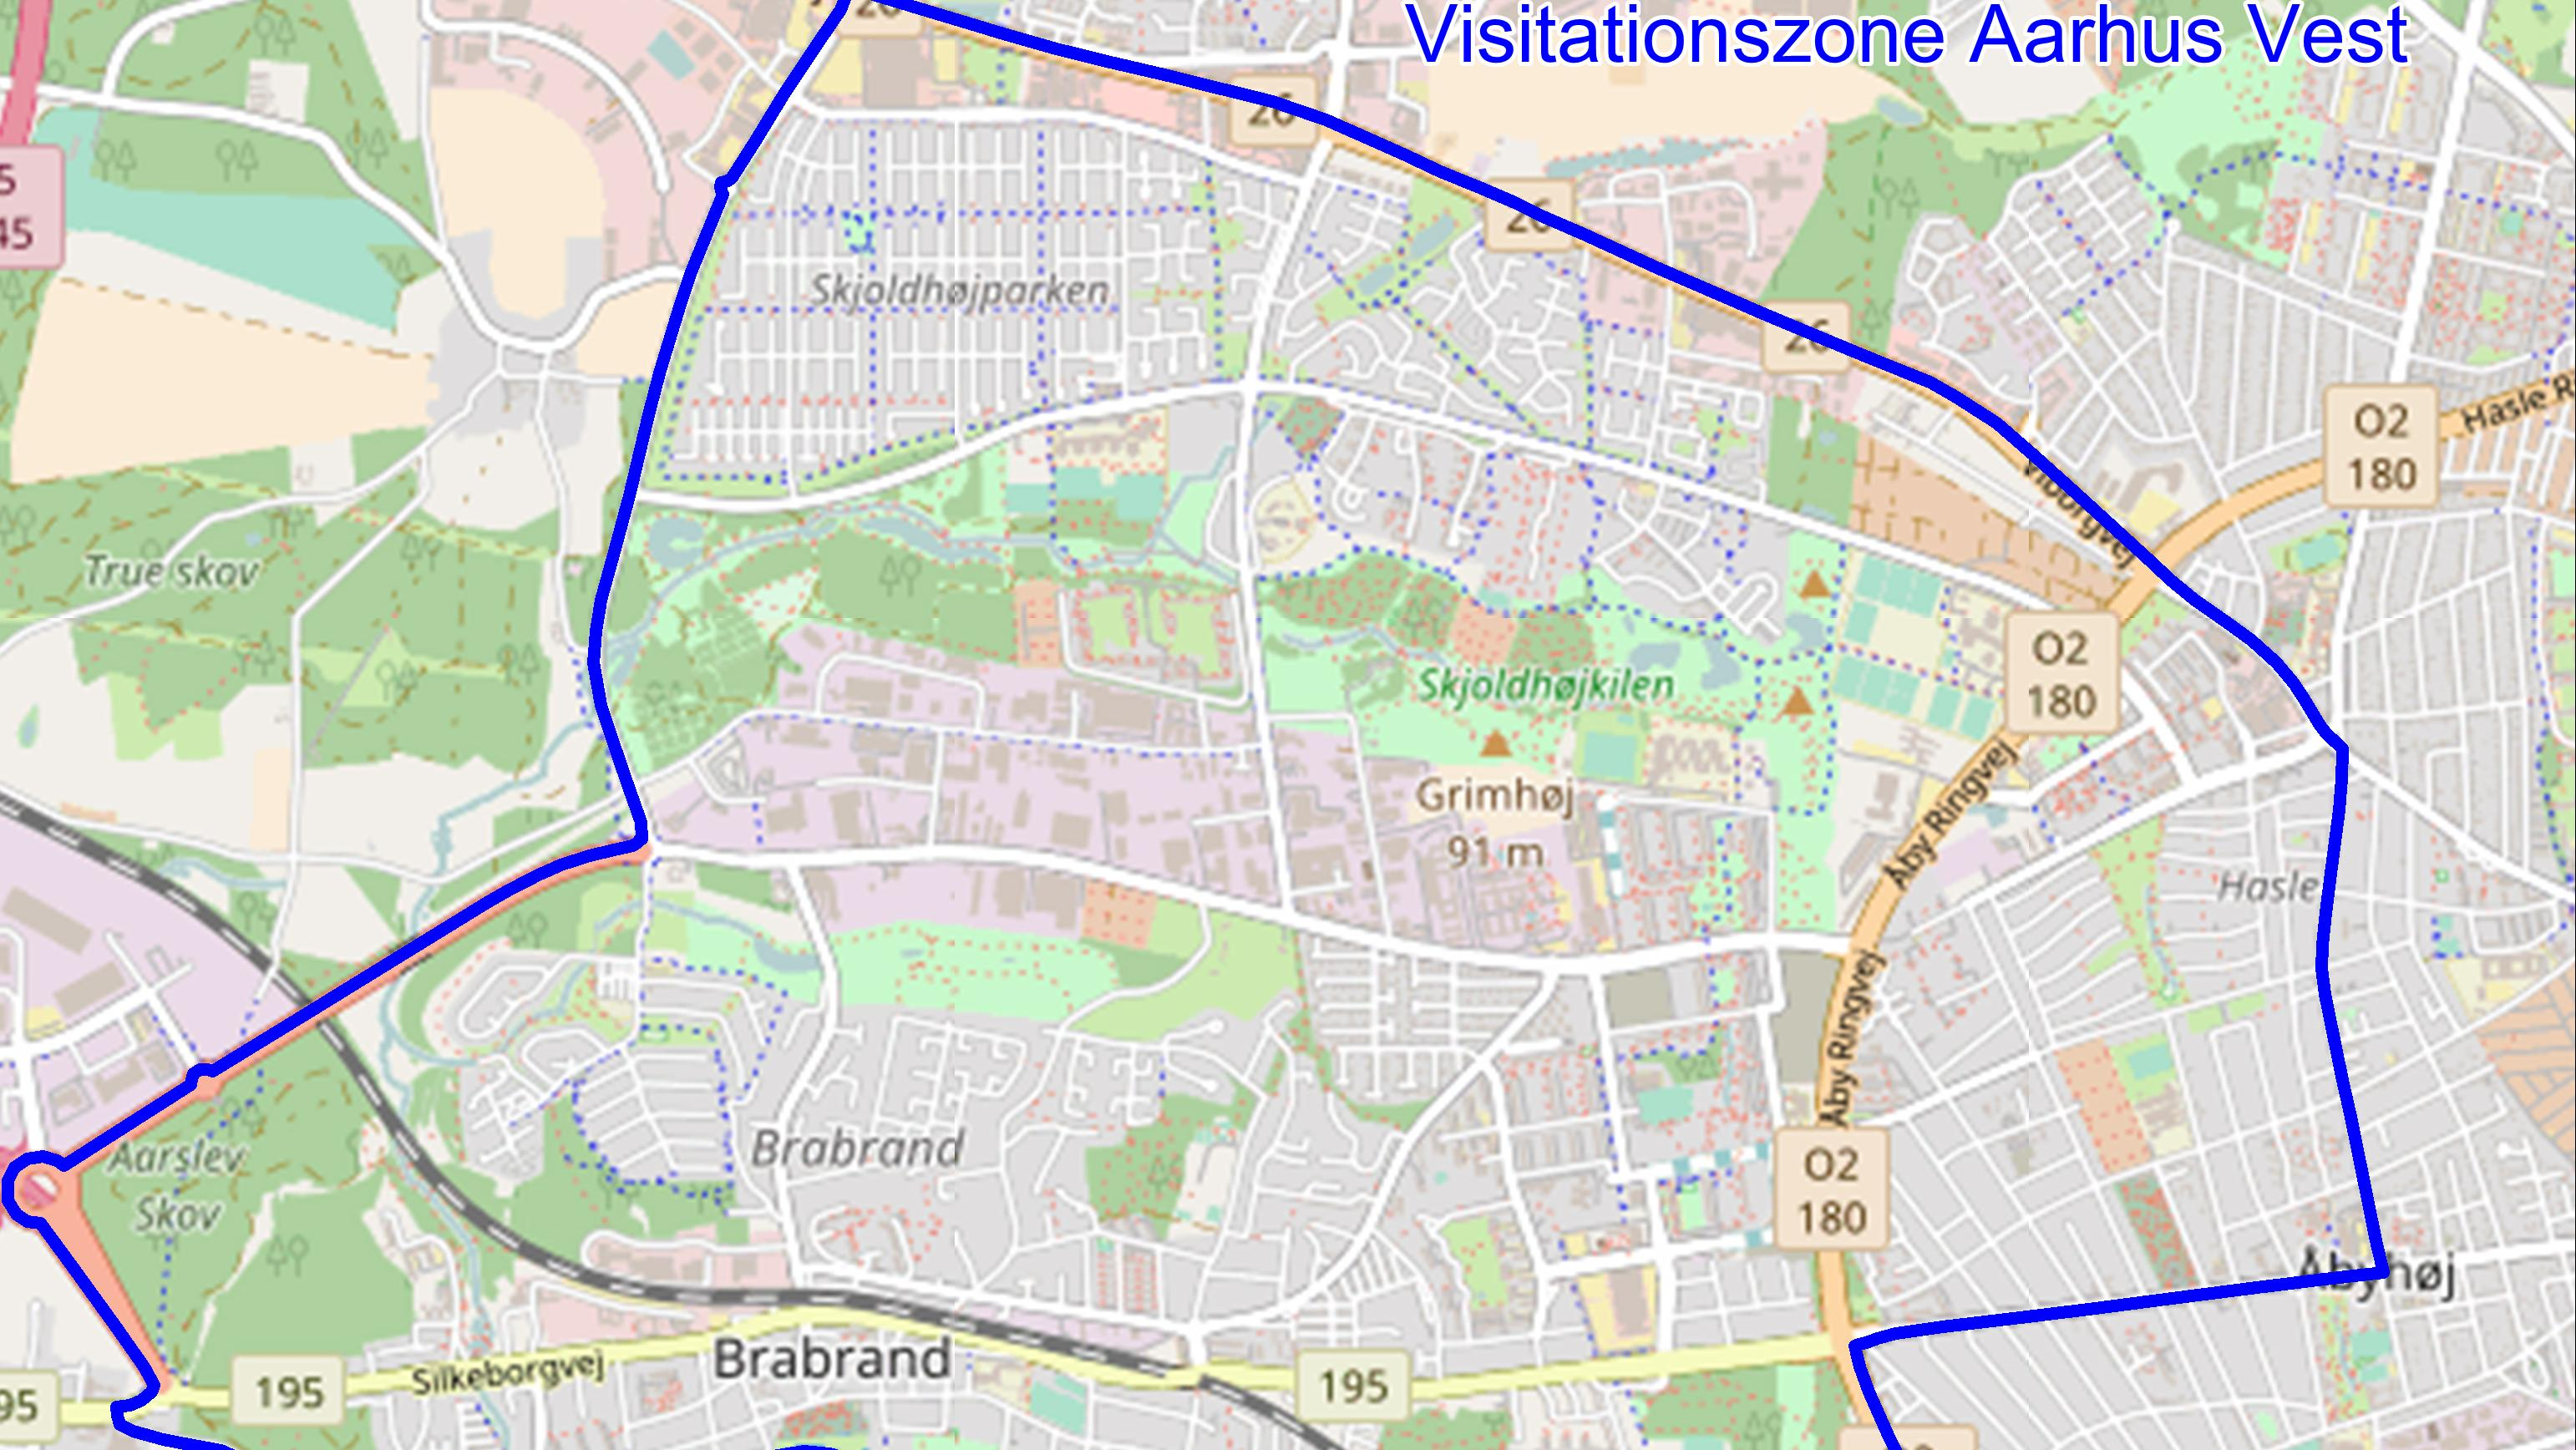 visitationszone_aarhus_vest_2.jpg